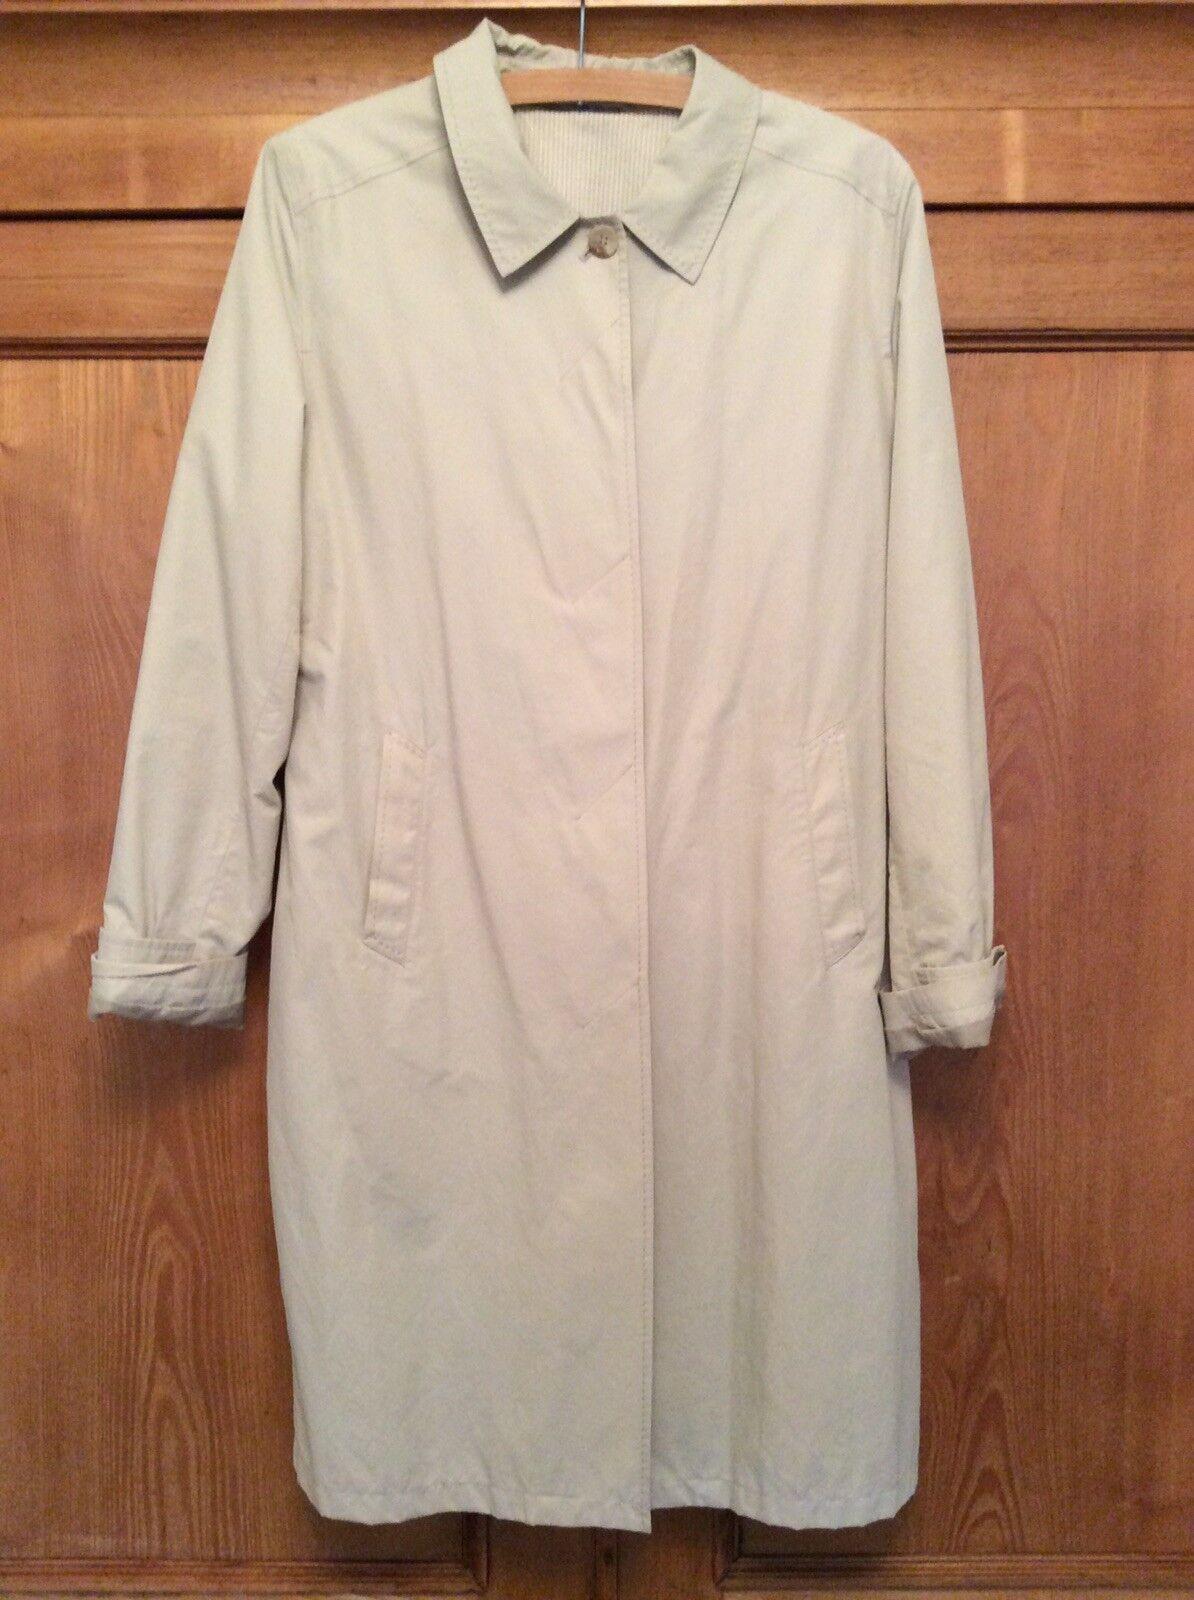 JFW Light Weight Natural Half Lined Raincoat Raincoat Raincoat (14) f2d0d8